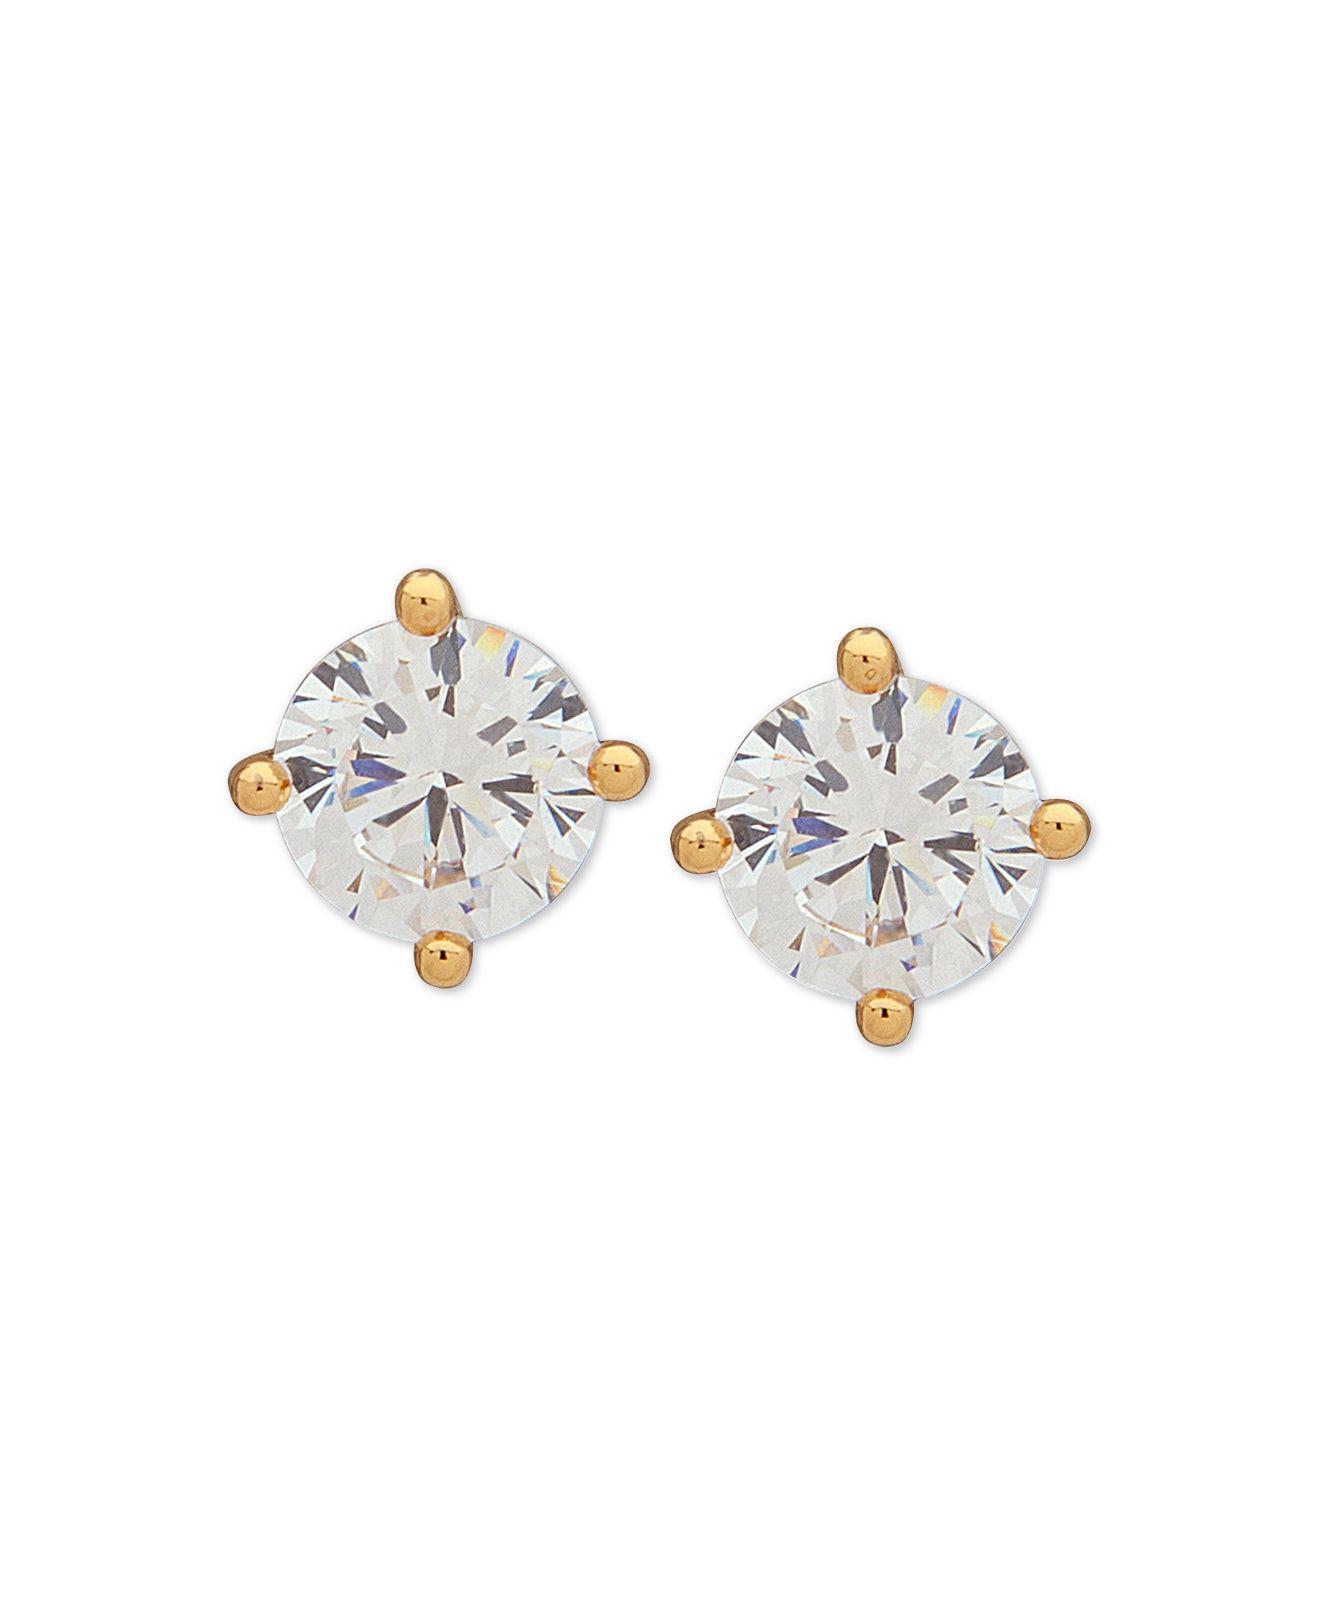 7a4c6743c Lyst - DKNY Gold-tone Crystal Stud Earrings in Metallic